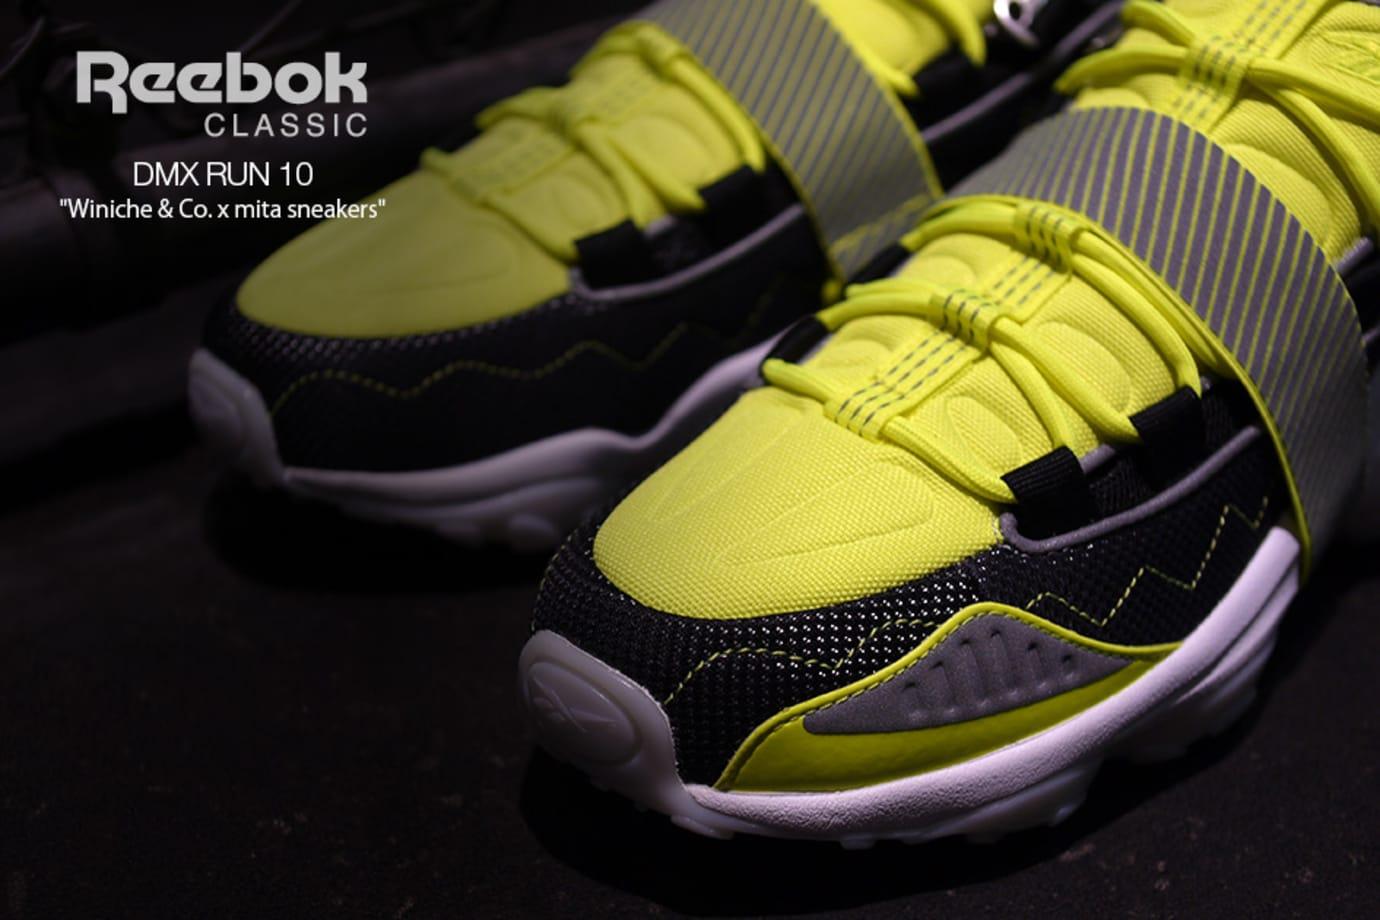 Winiche & Co x Mita Sneakers x Reebok DMX Run 10 (Toe)